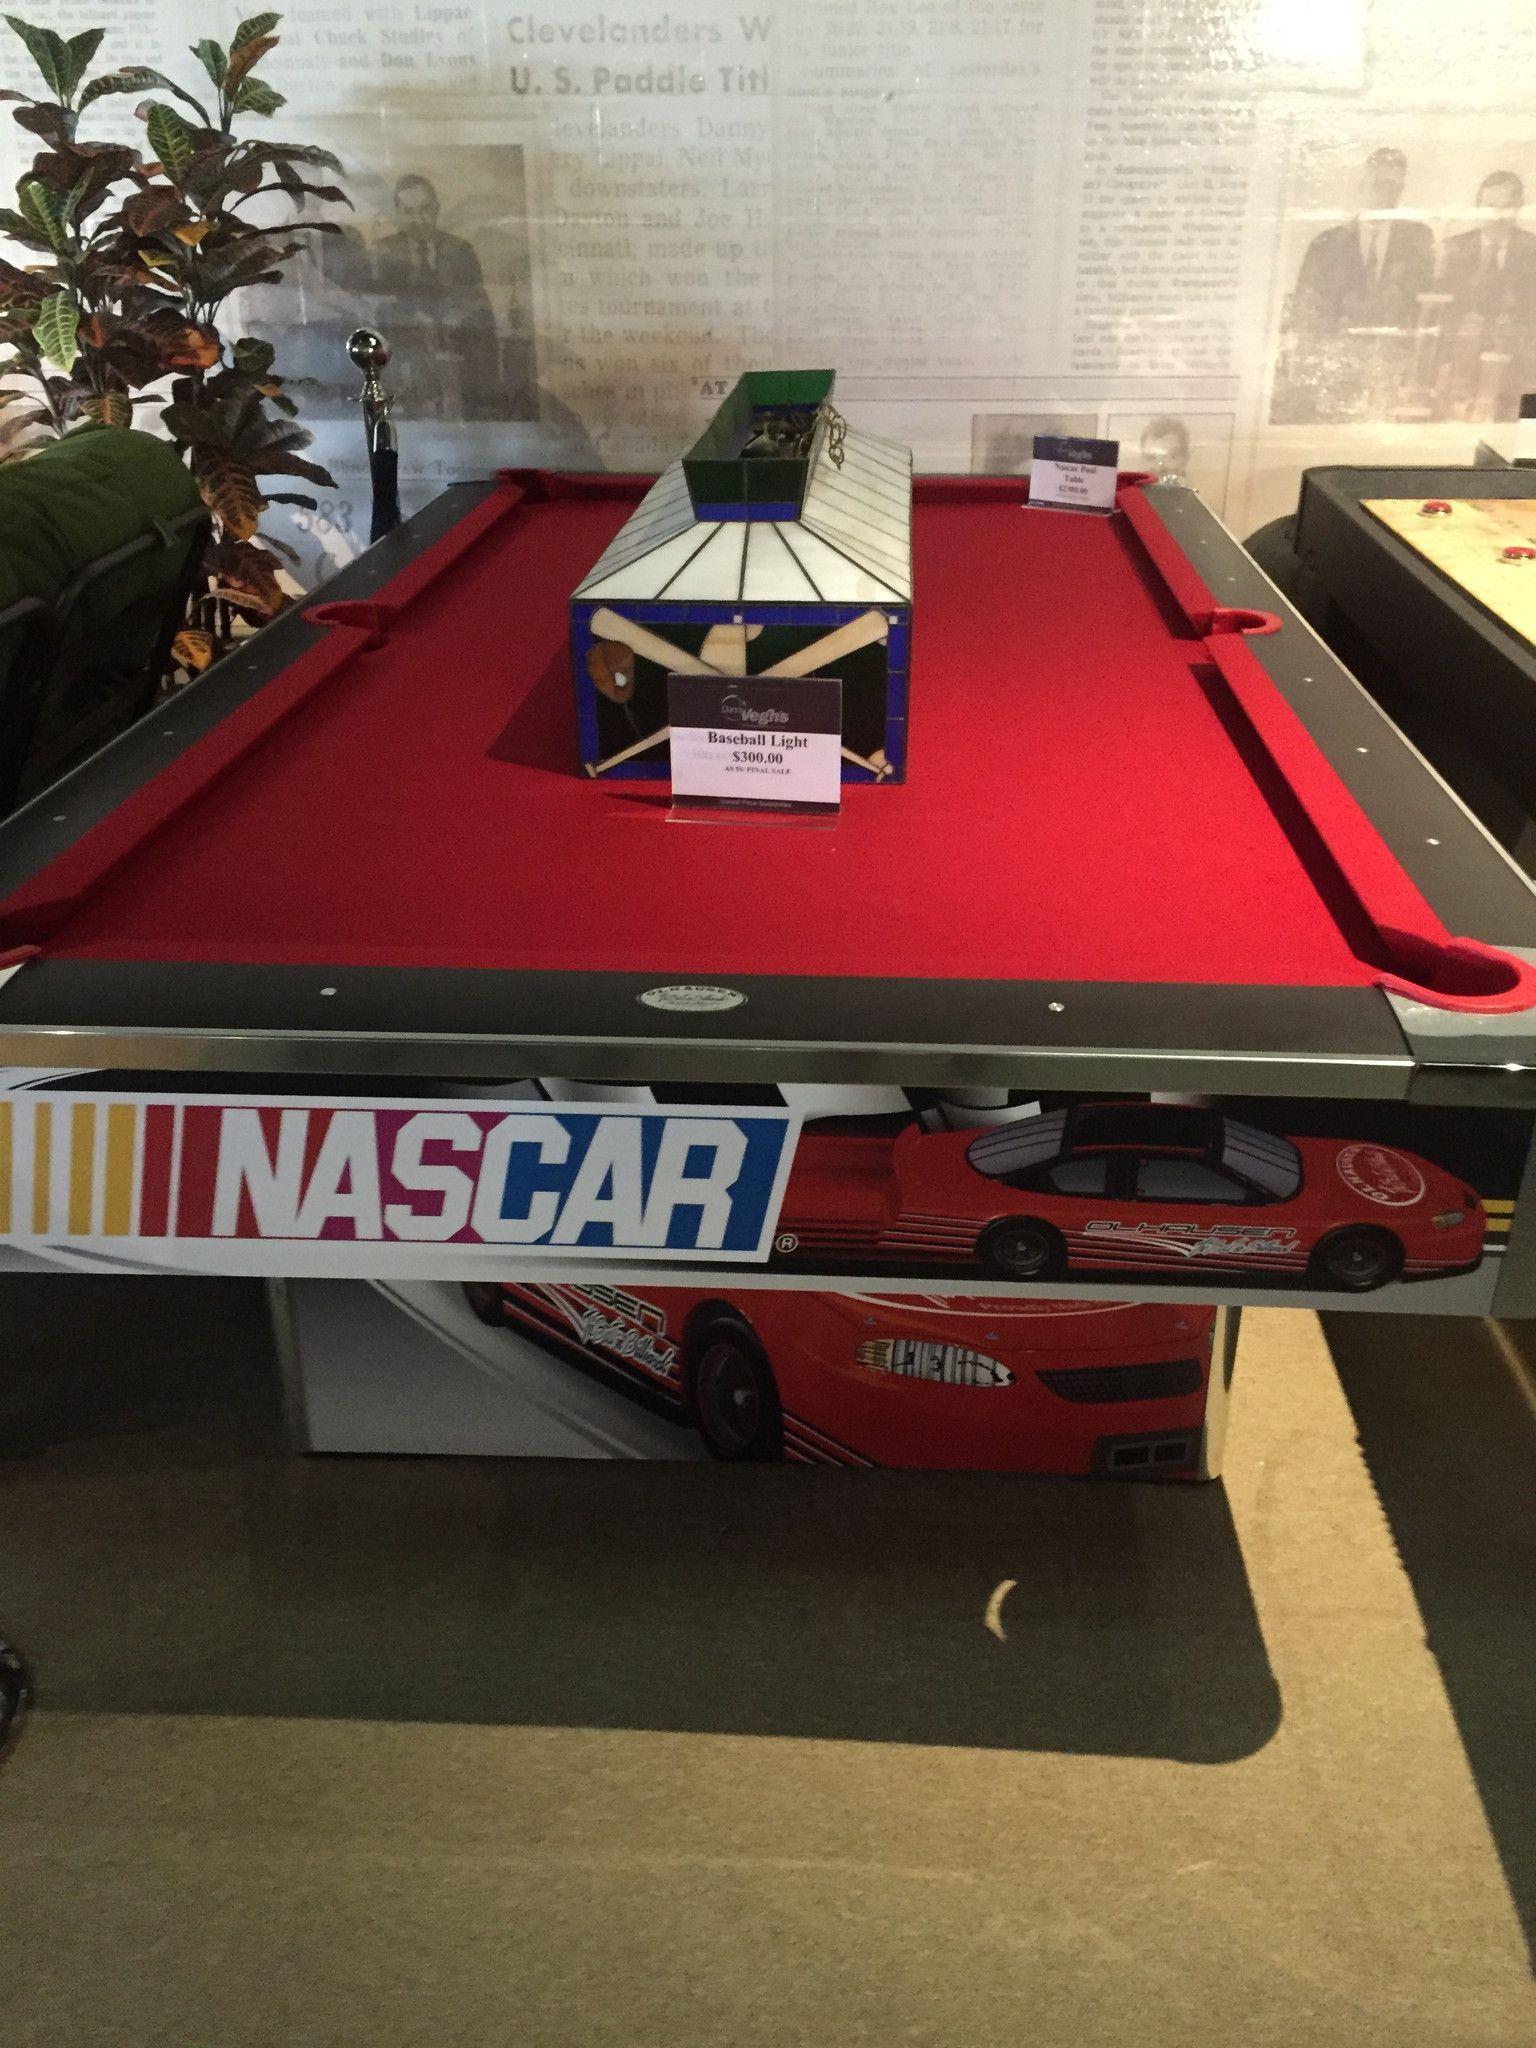 NASCAR Pool Table Fun Games Pinterest Pool Table Game Rooms - Nascar pool table light